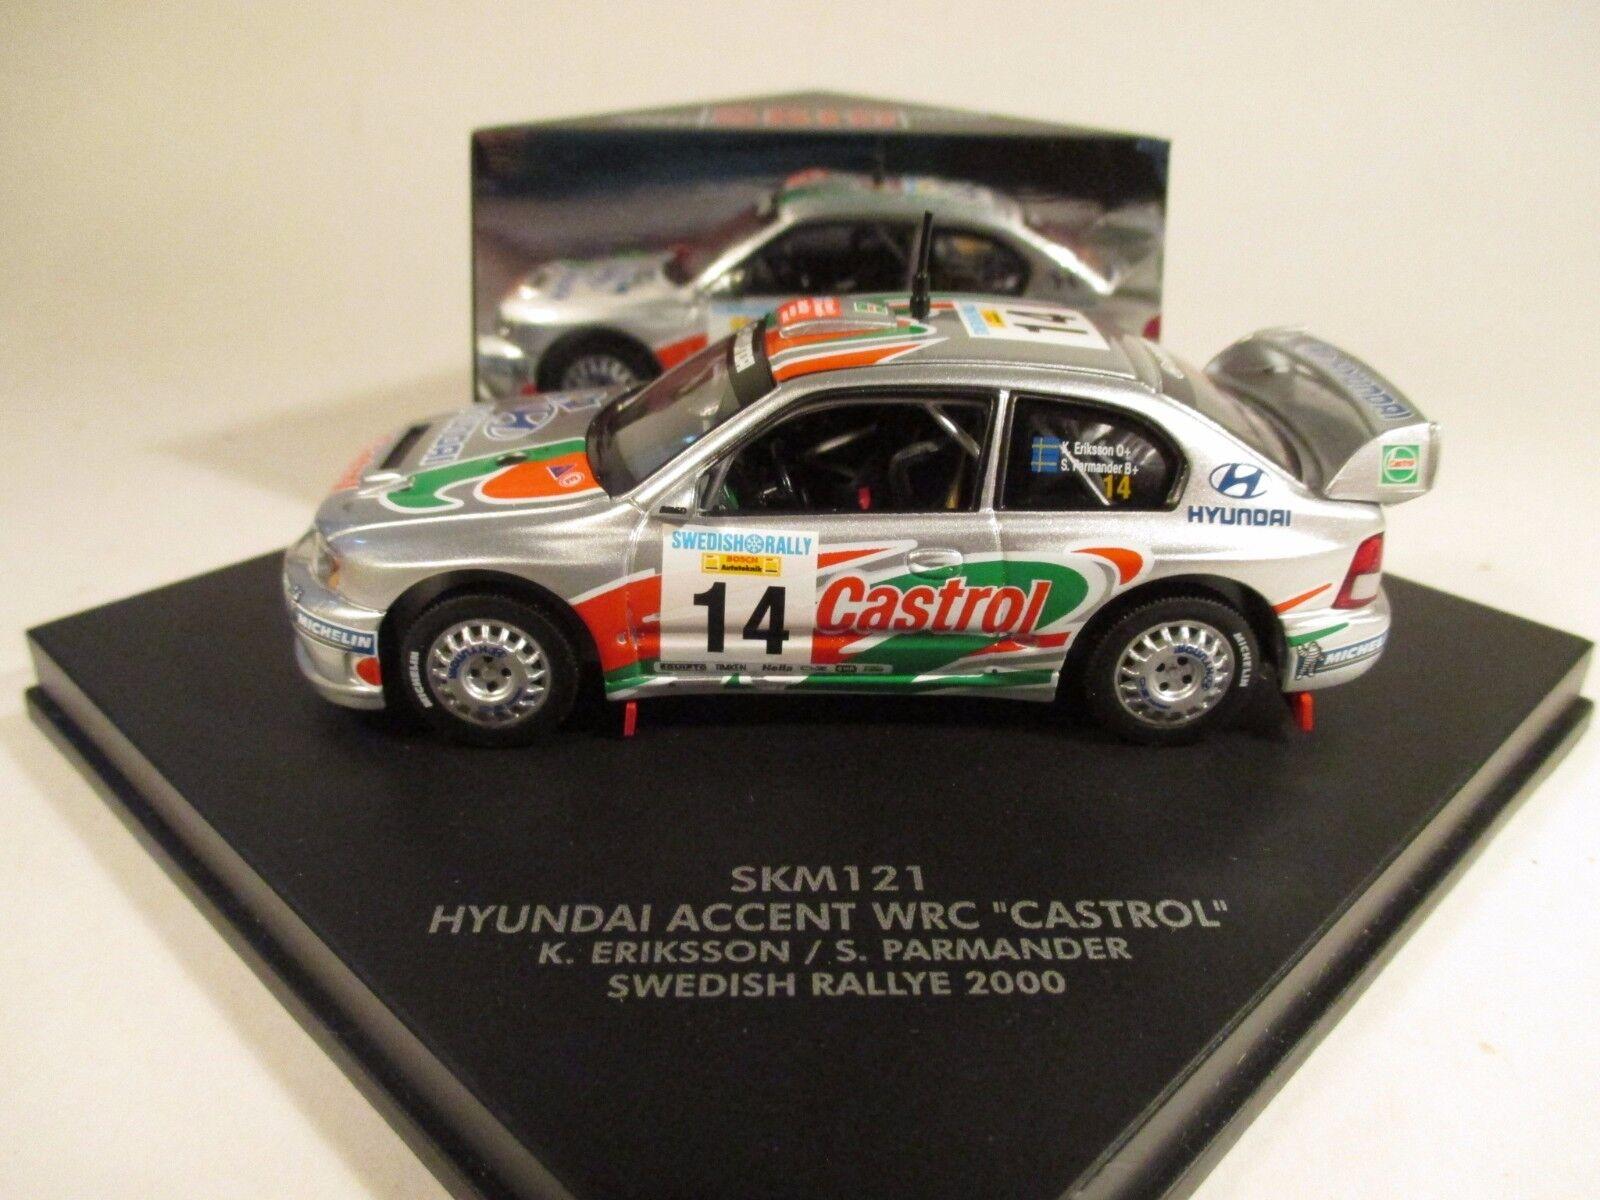 Skid SKM121 Hyundai Accent WRC Castrol sueco Rallye 2000 1 43 Menta en caja